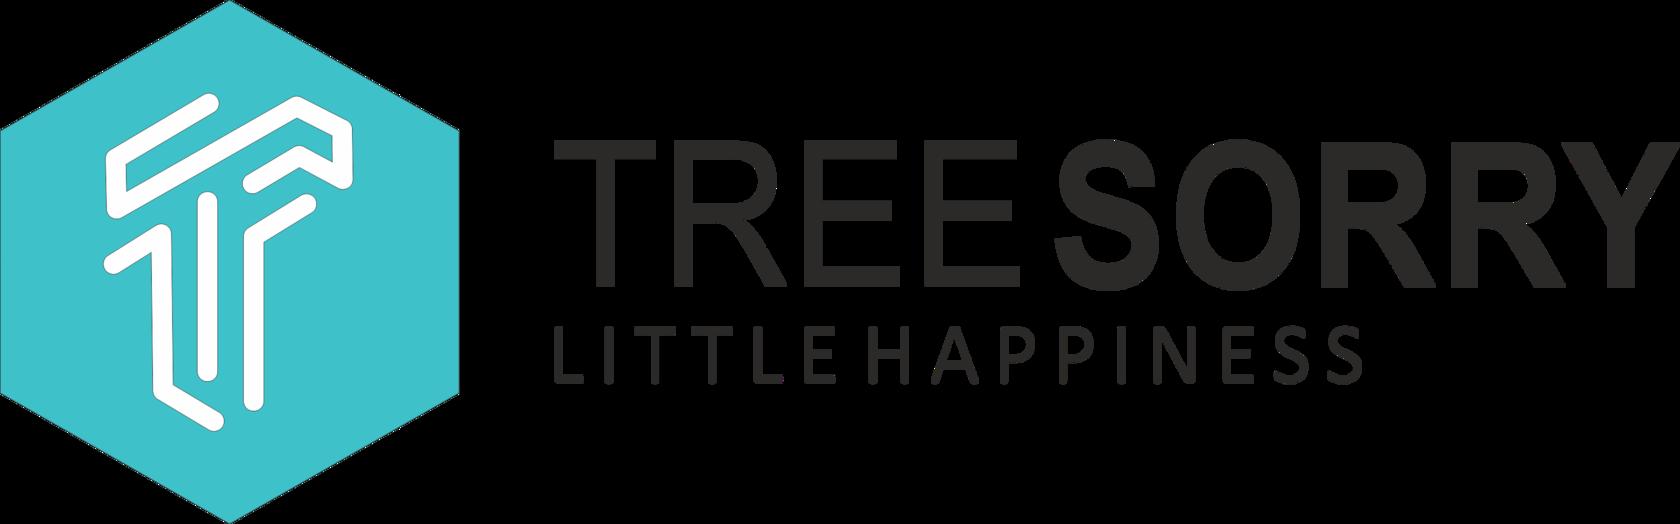 TreeSorry furniture for children development